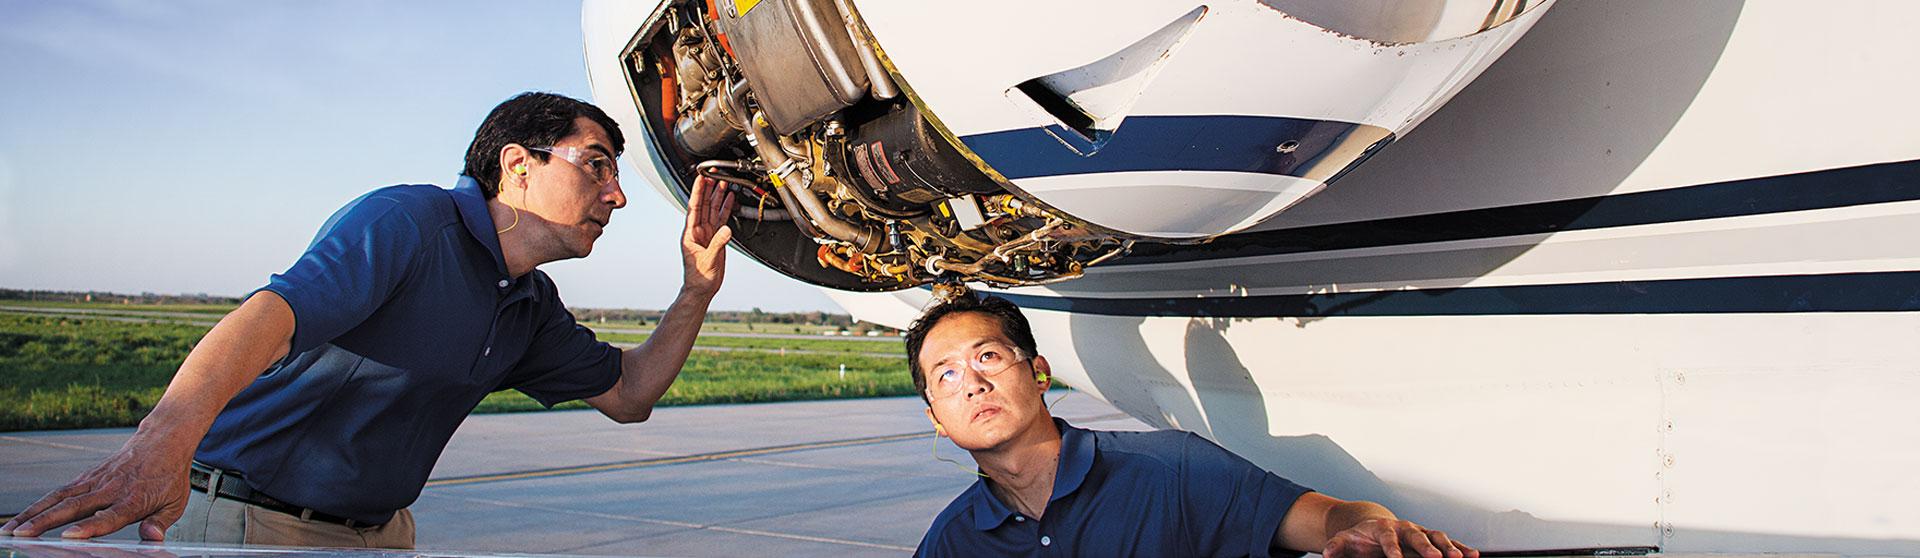 TFE731 Engine Maintenance | World Class Aircraft Engine Services